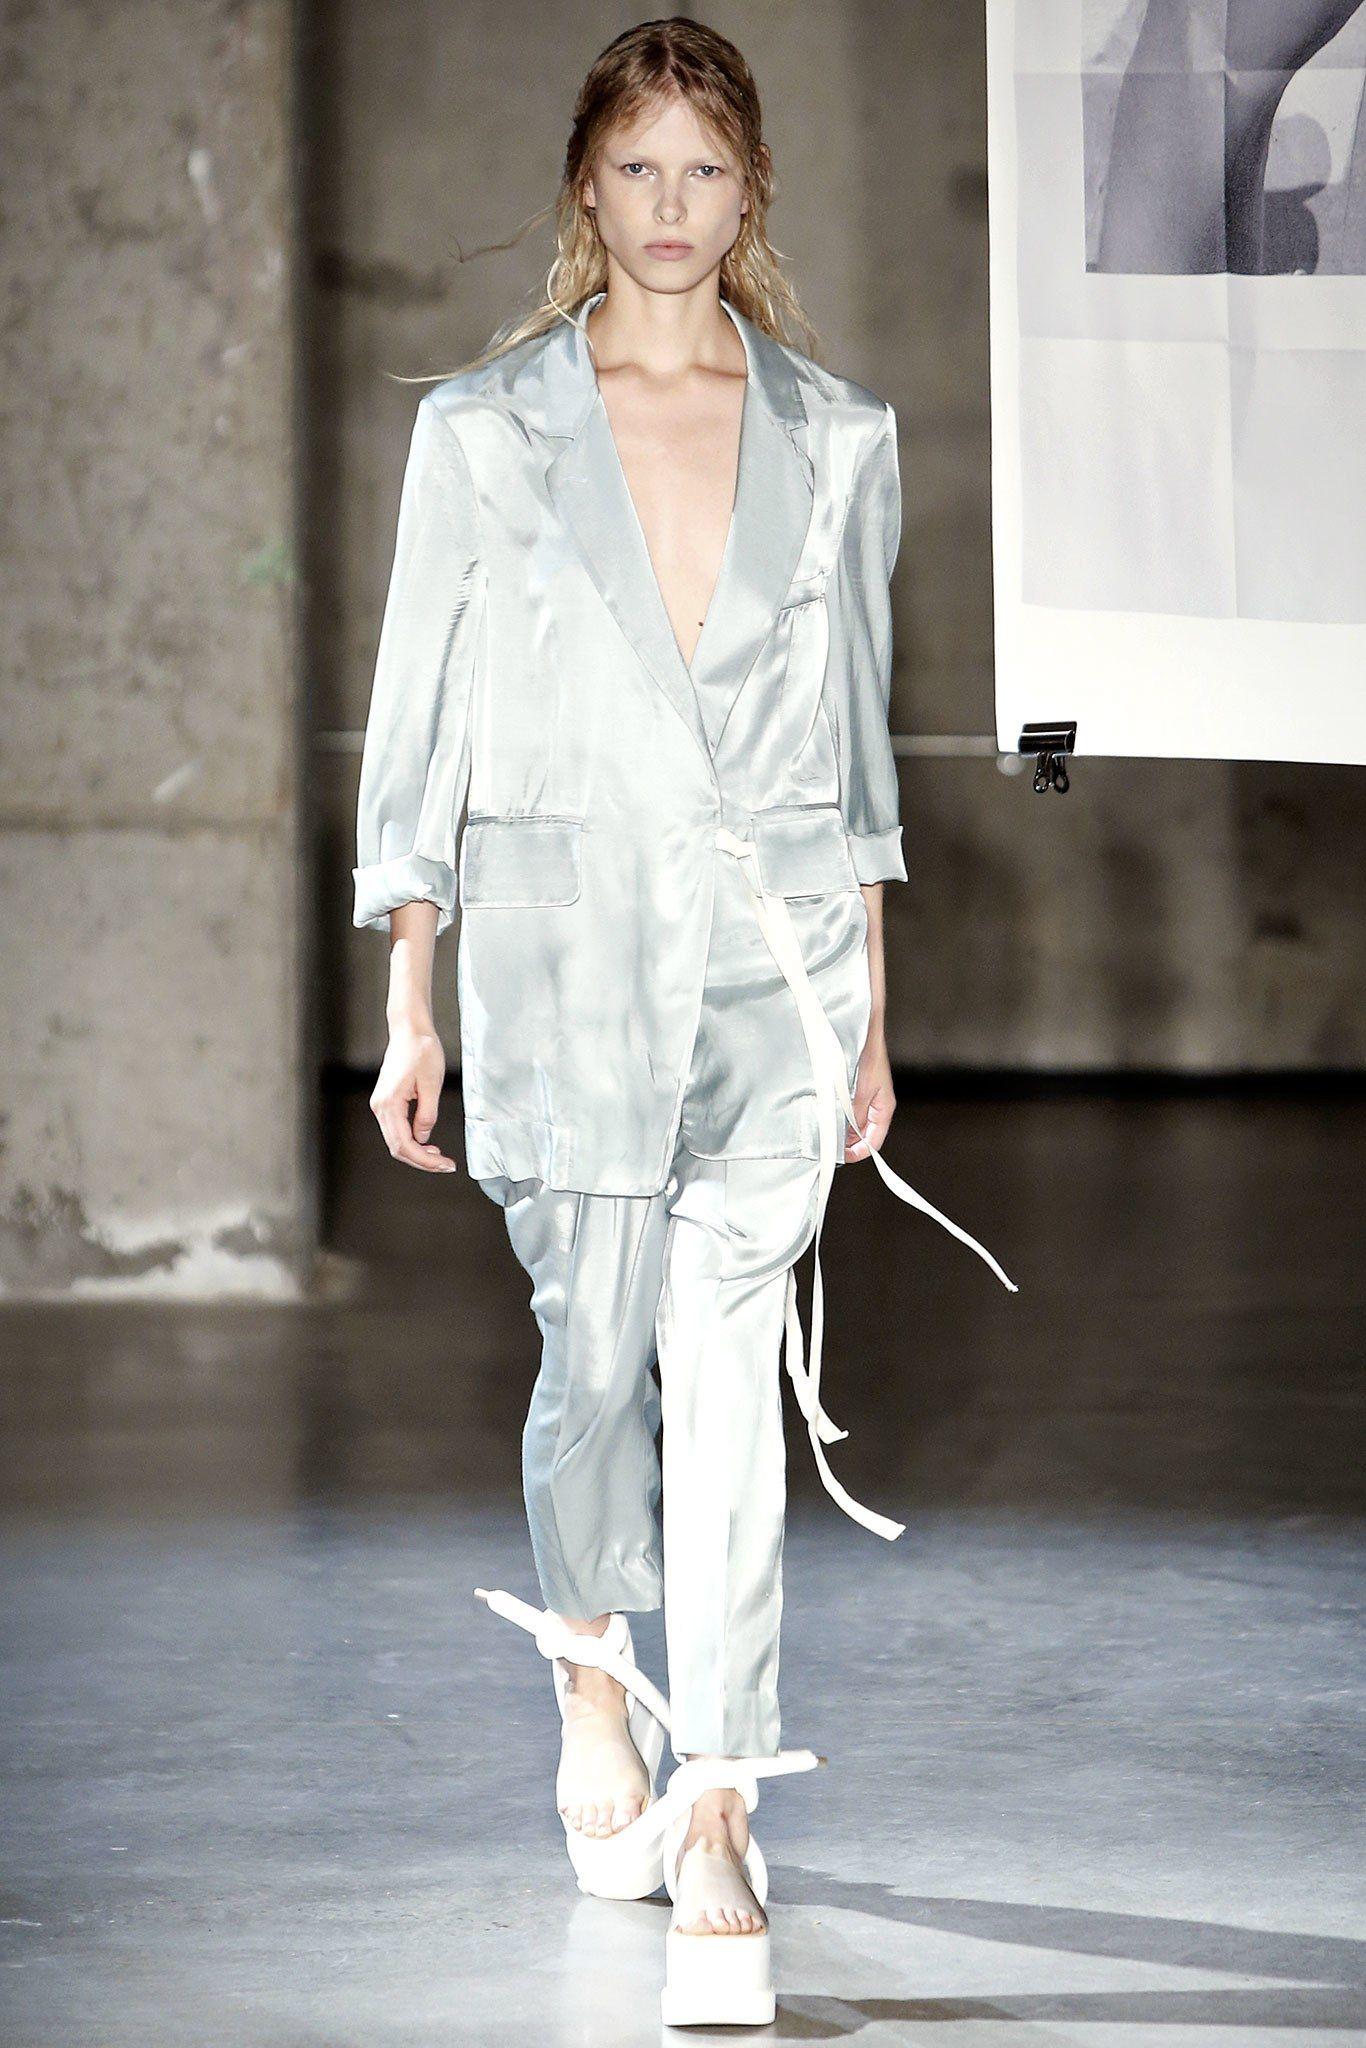 MM6 Maison Margiela Spring 2015 Ready-to-Wear Fashion Show - Lina Spangenberg (Fusion)